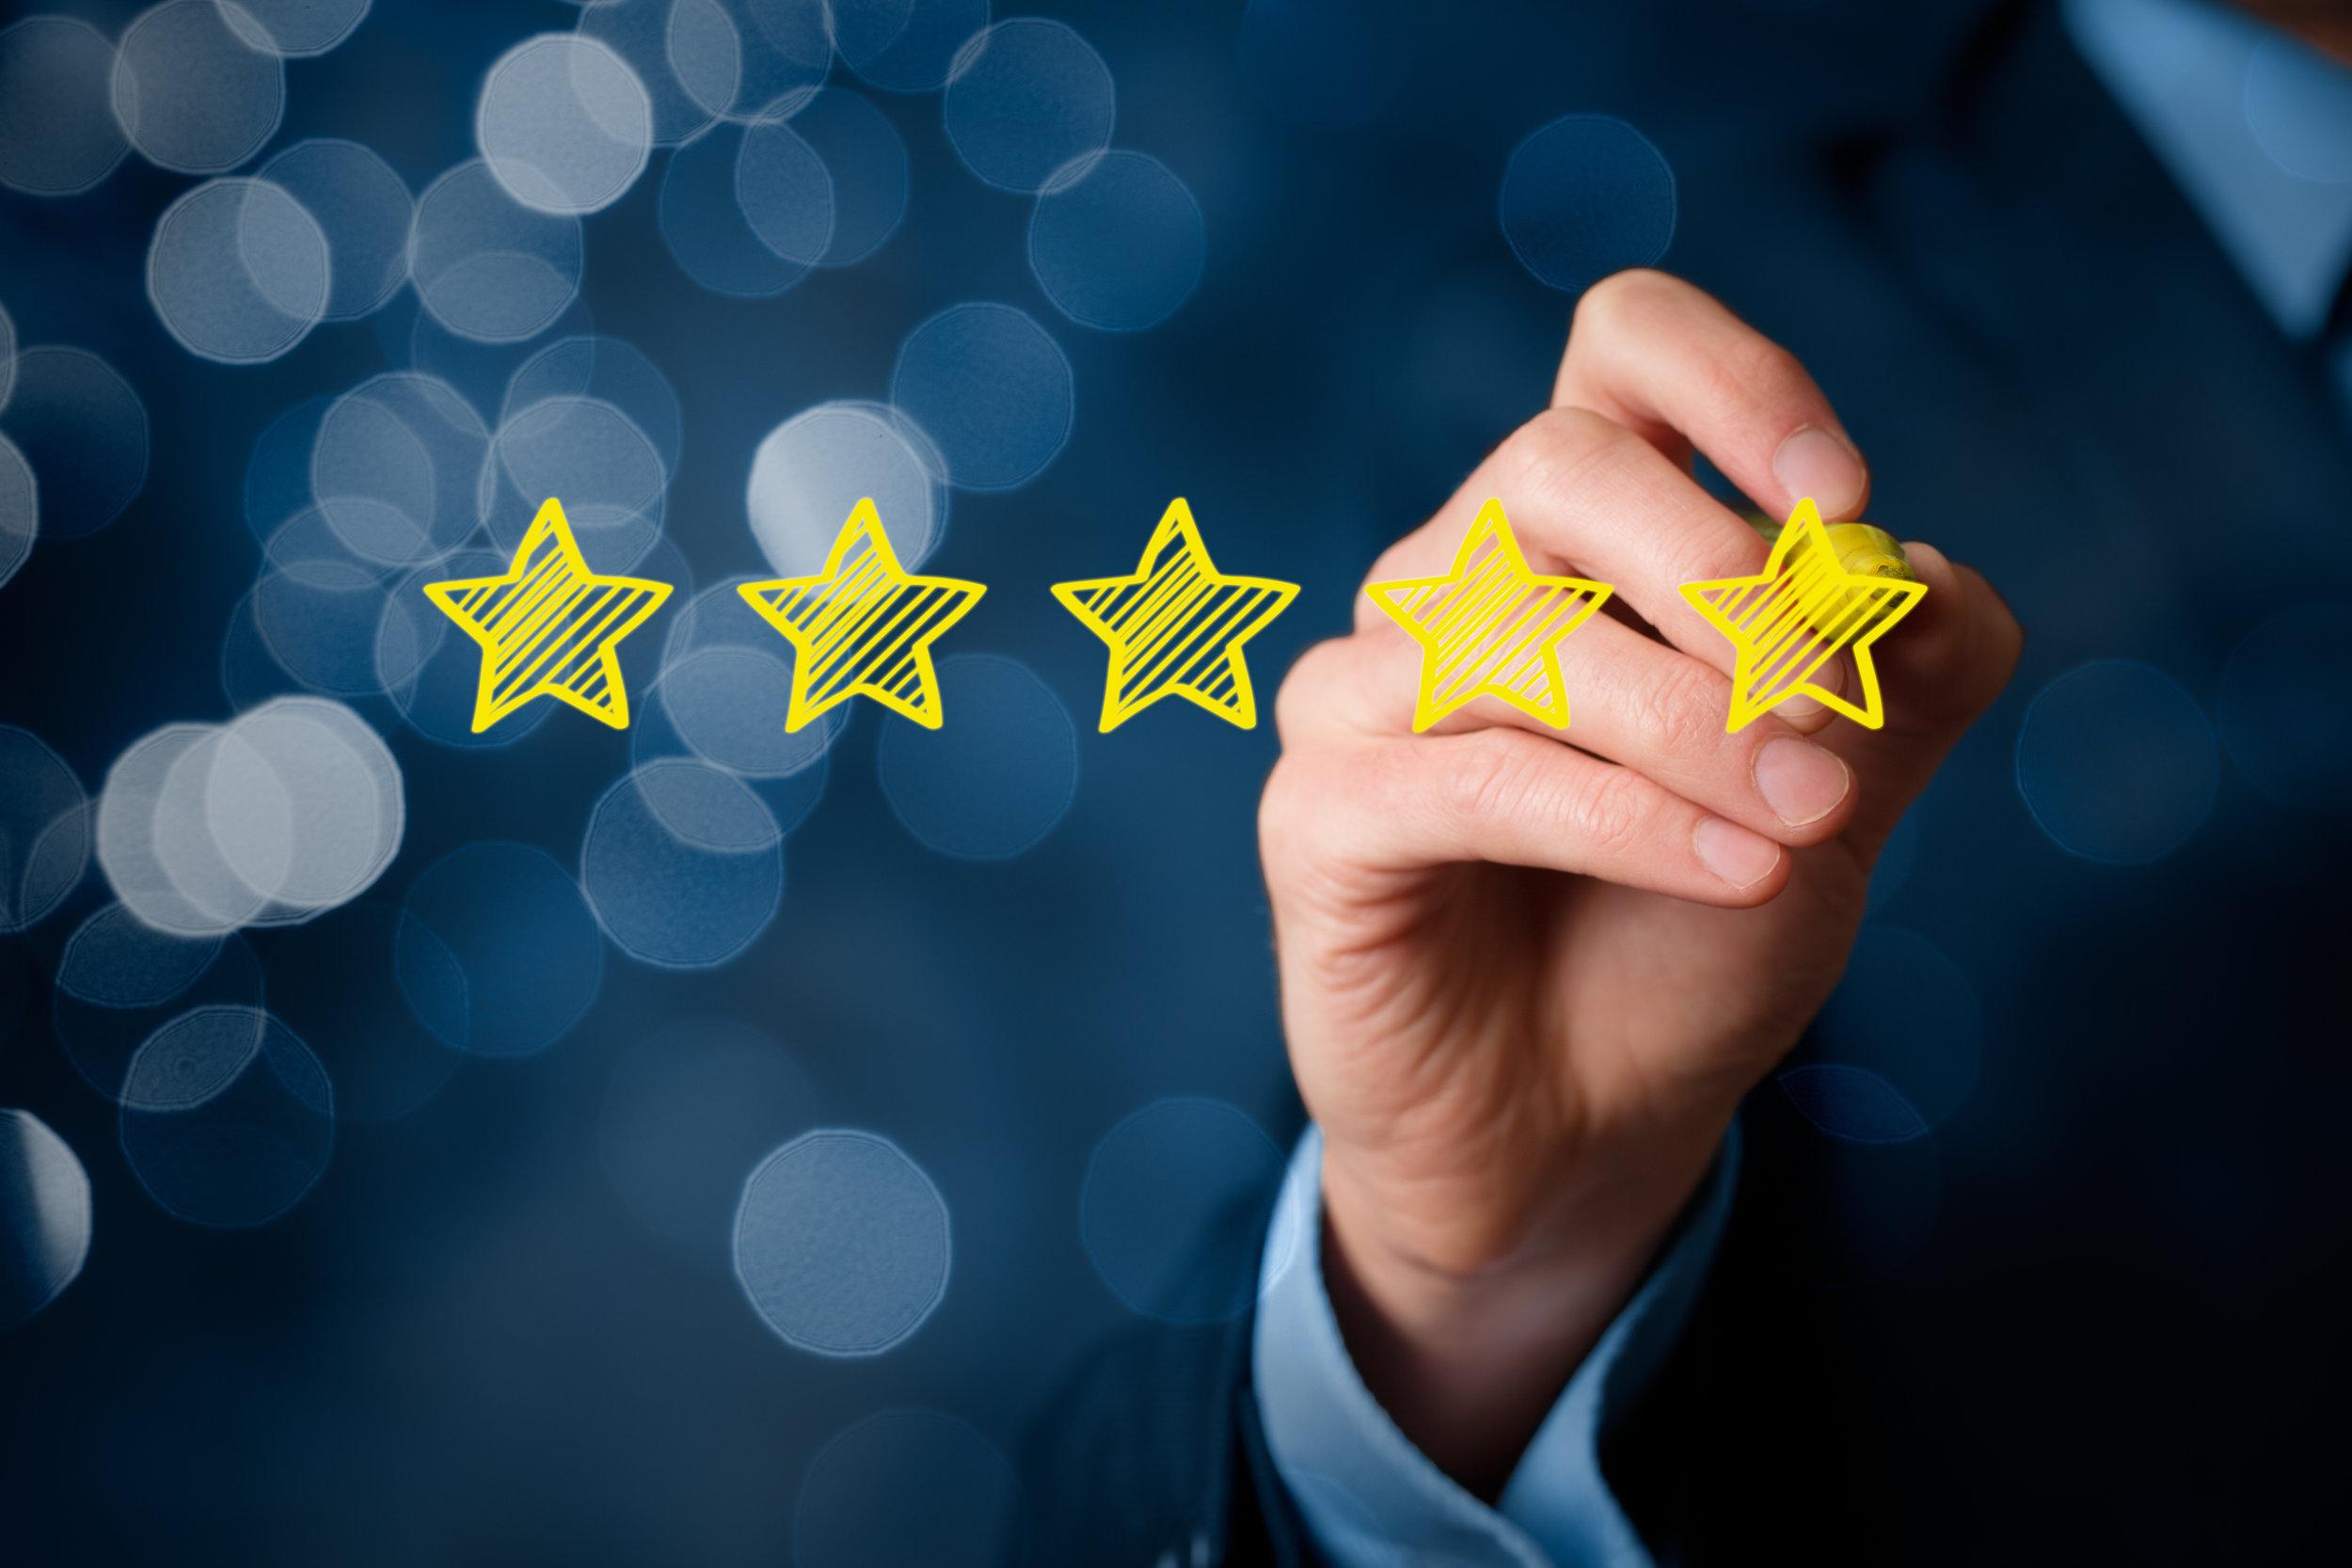 Review increase rating